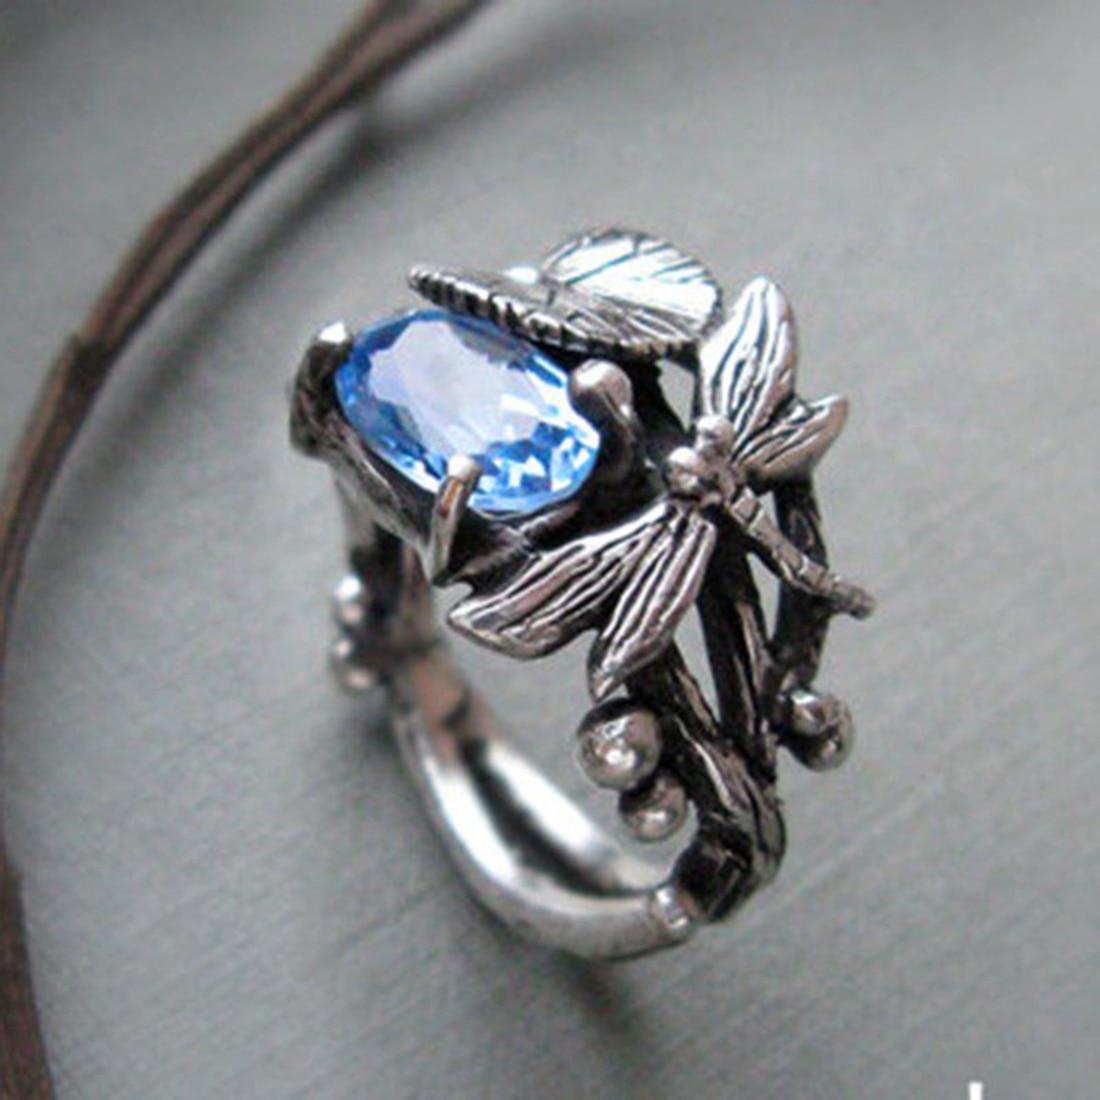 Jiayiqi 2018 Fashion Dragonfly Lotus Ring Bohe Silver